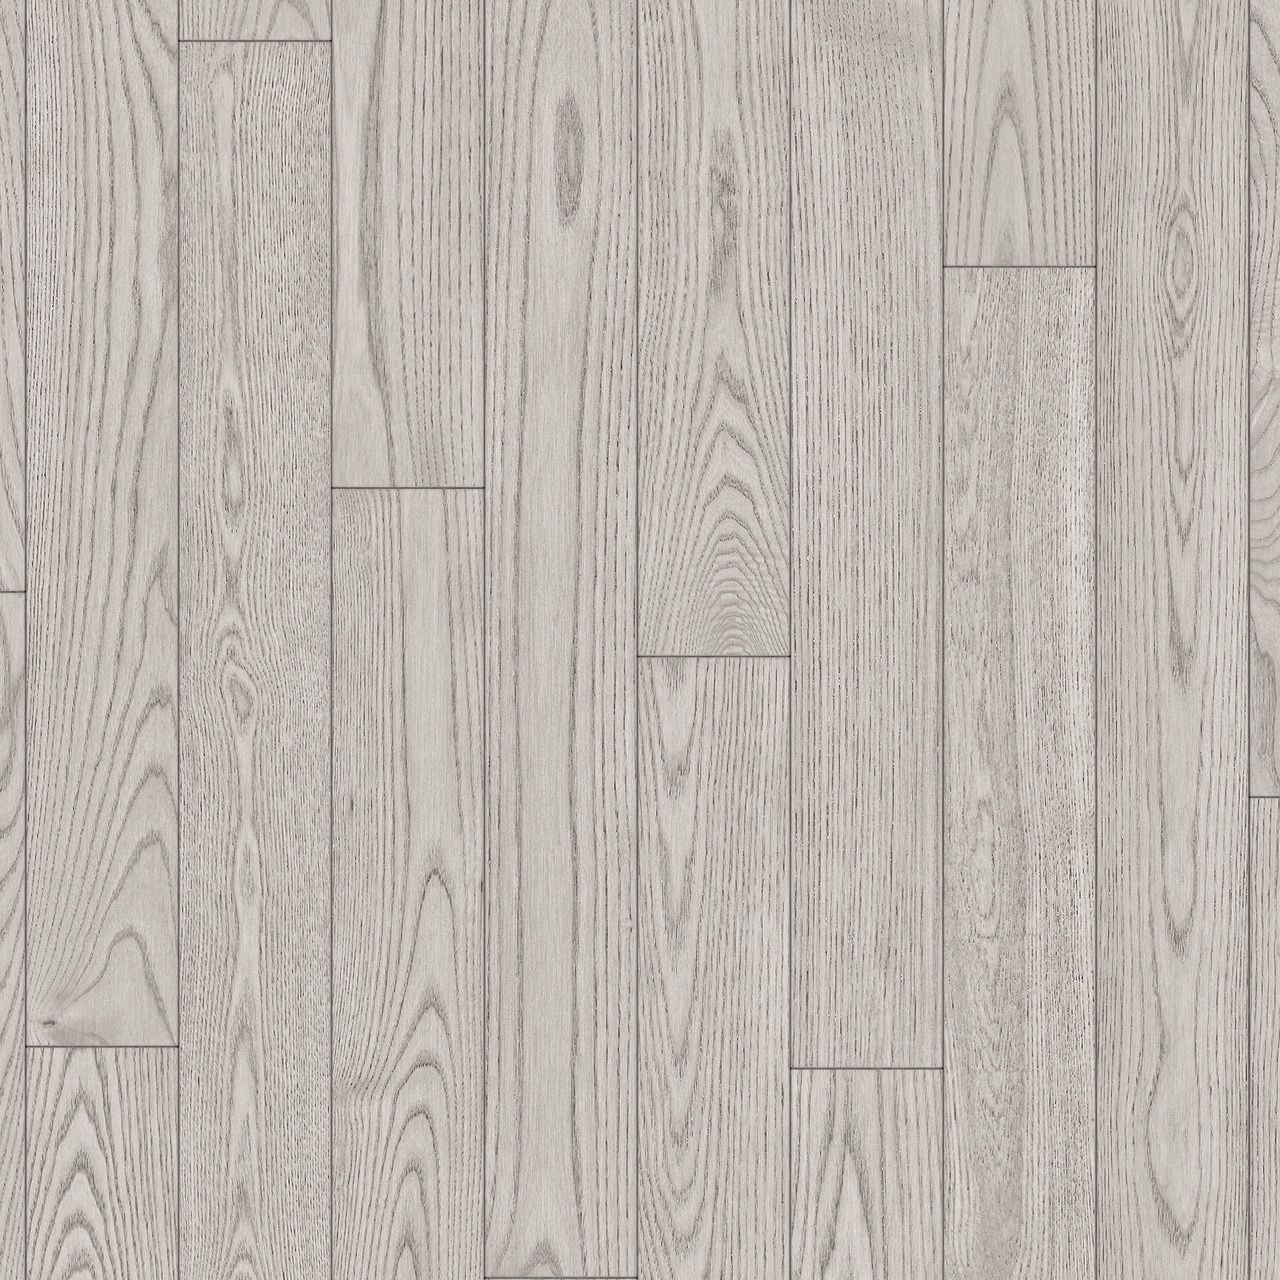 White Wooden Floor Texture